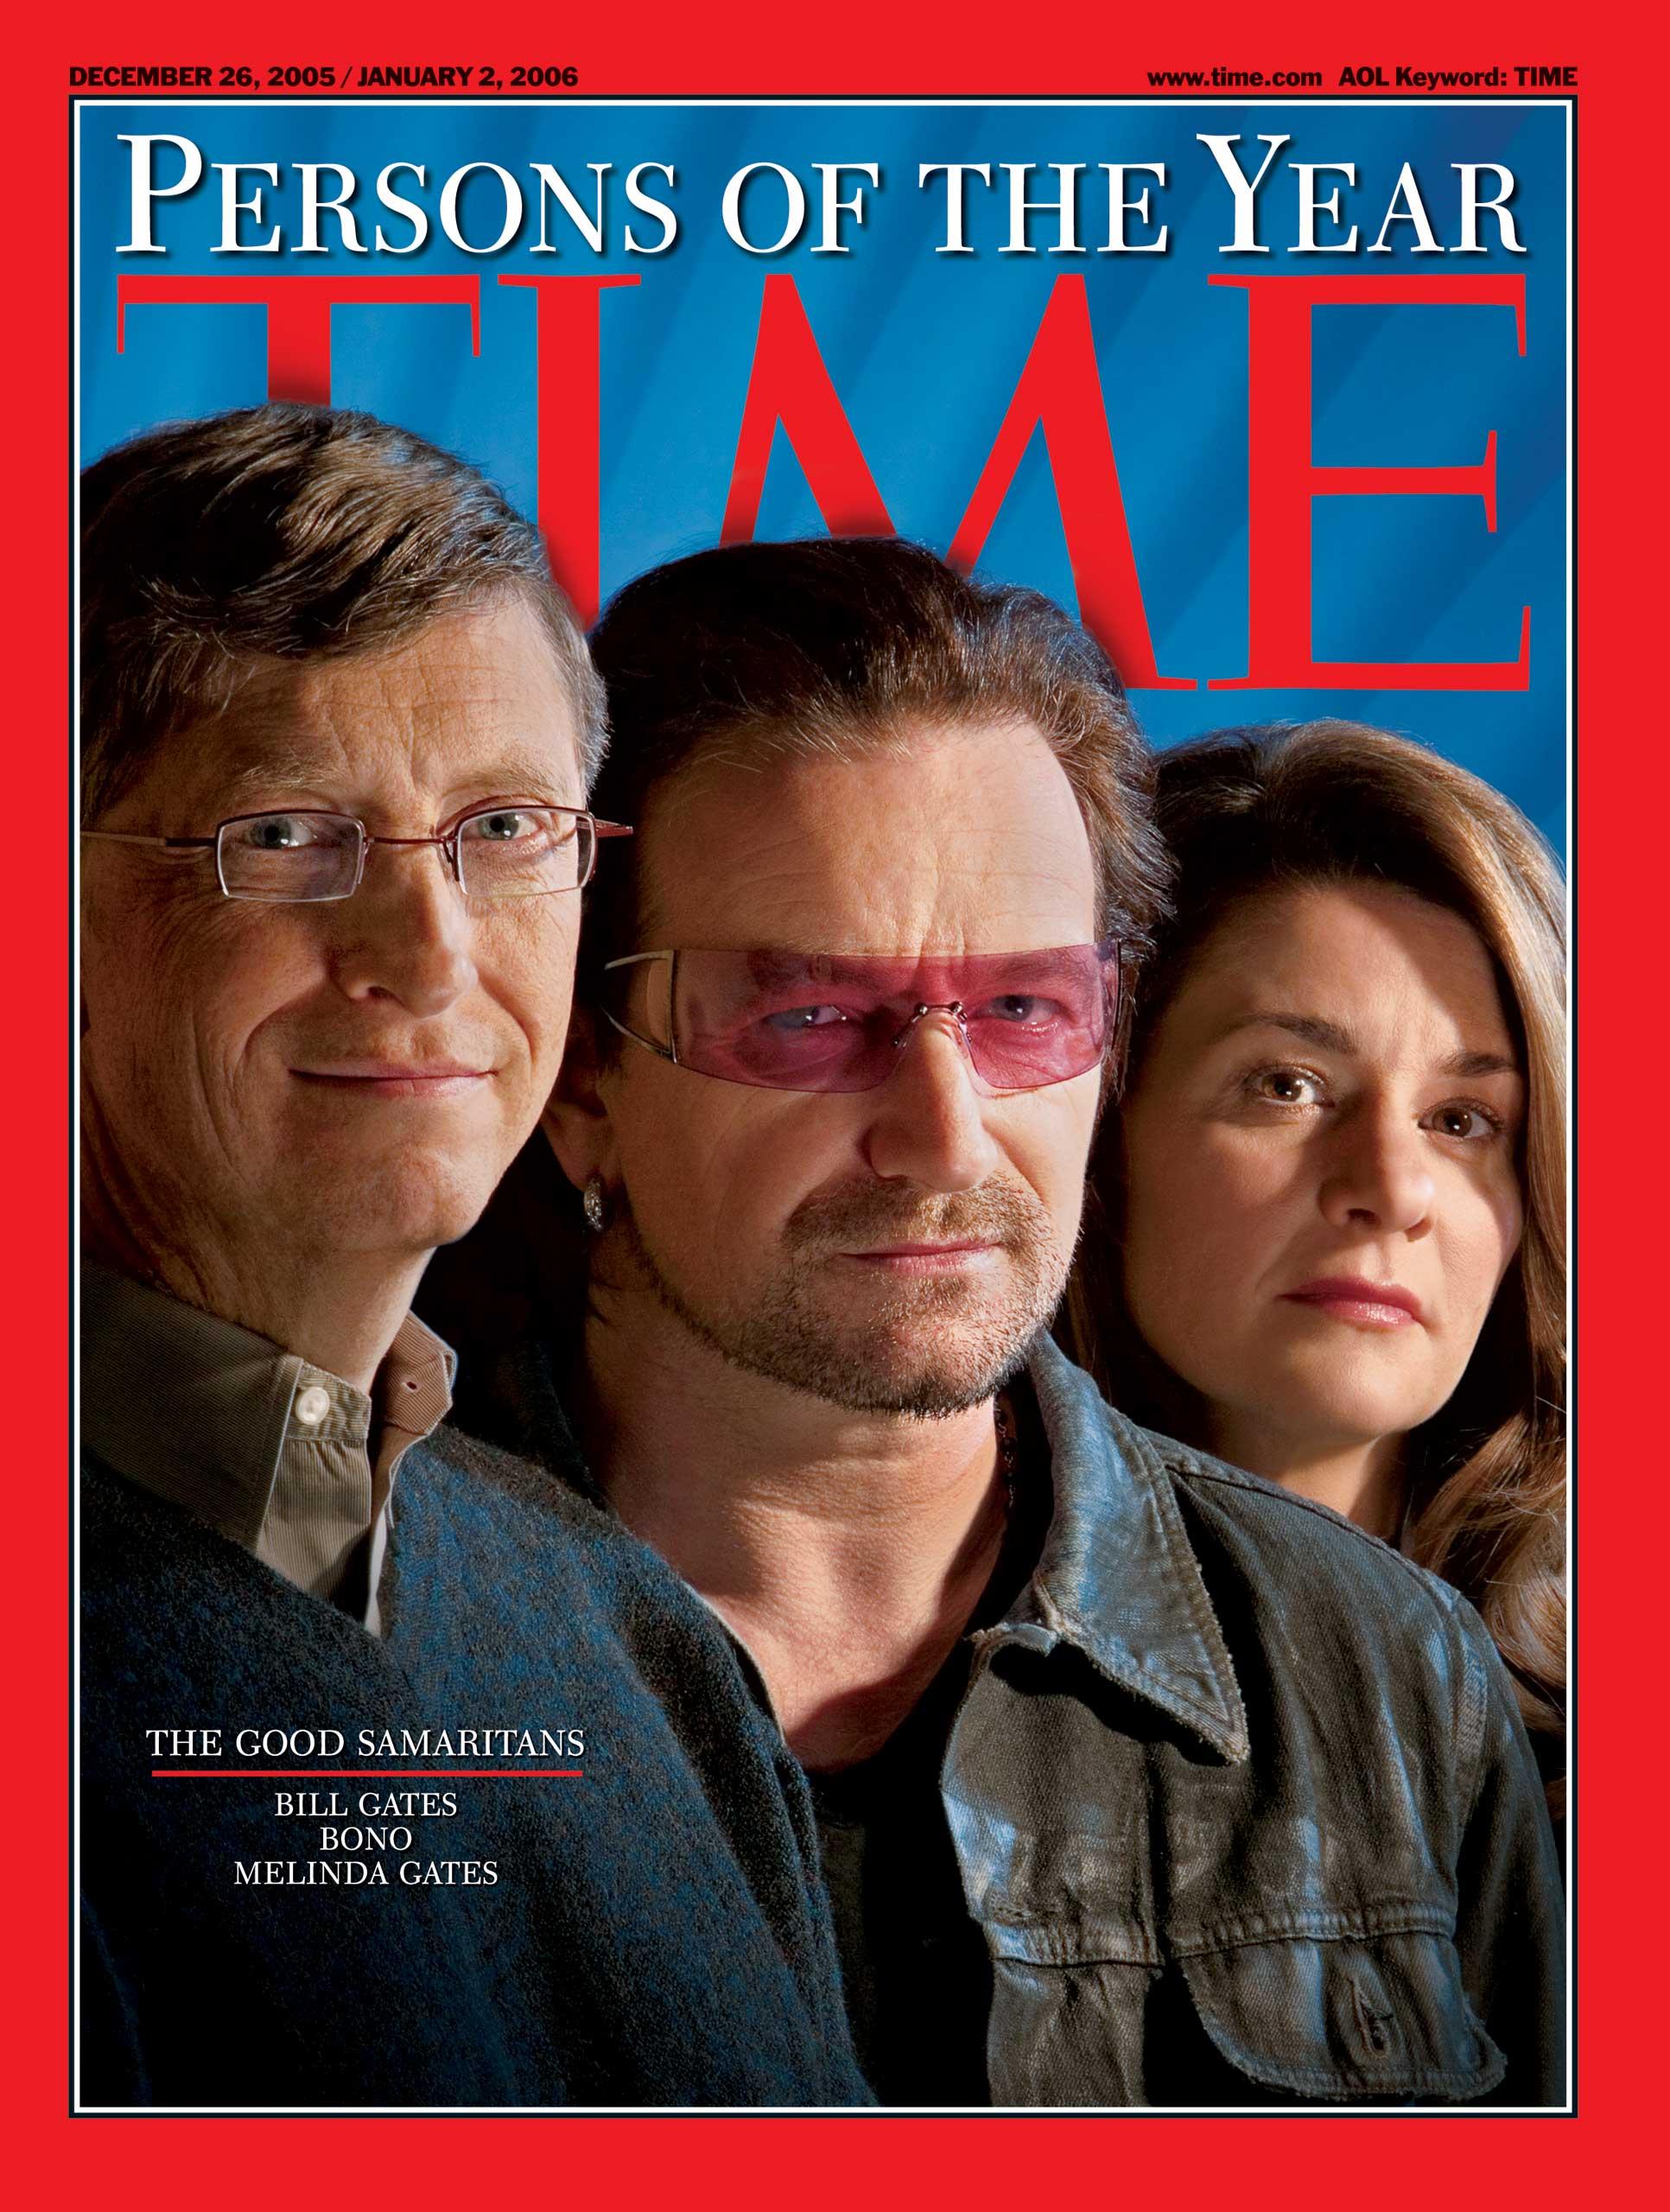 2005: The Good Samaritans: Bill Gates, Bono, Melinda Gates